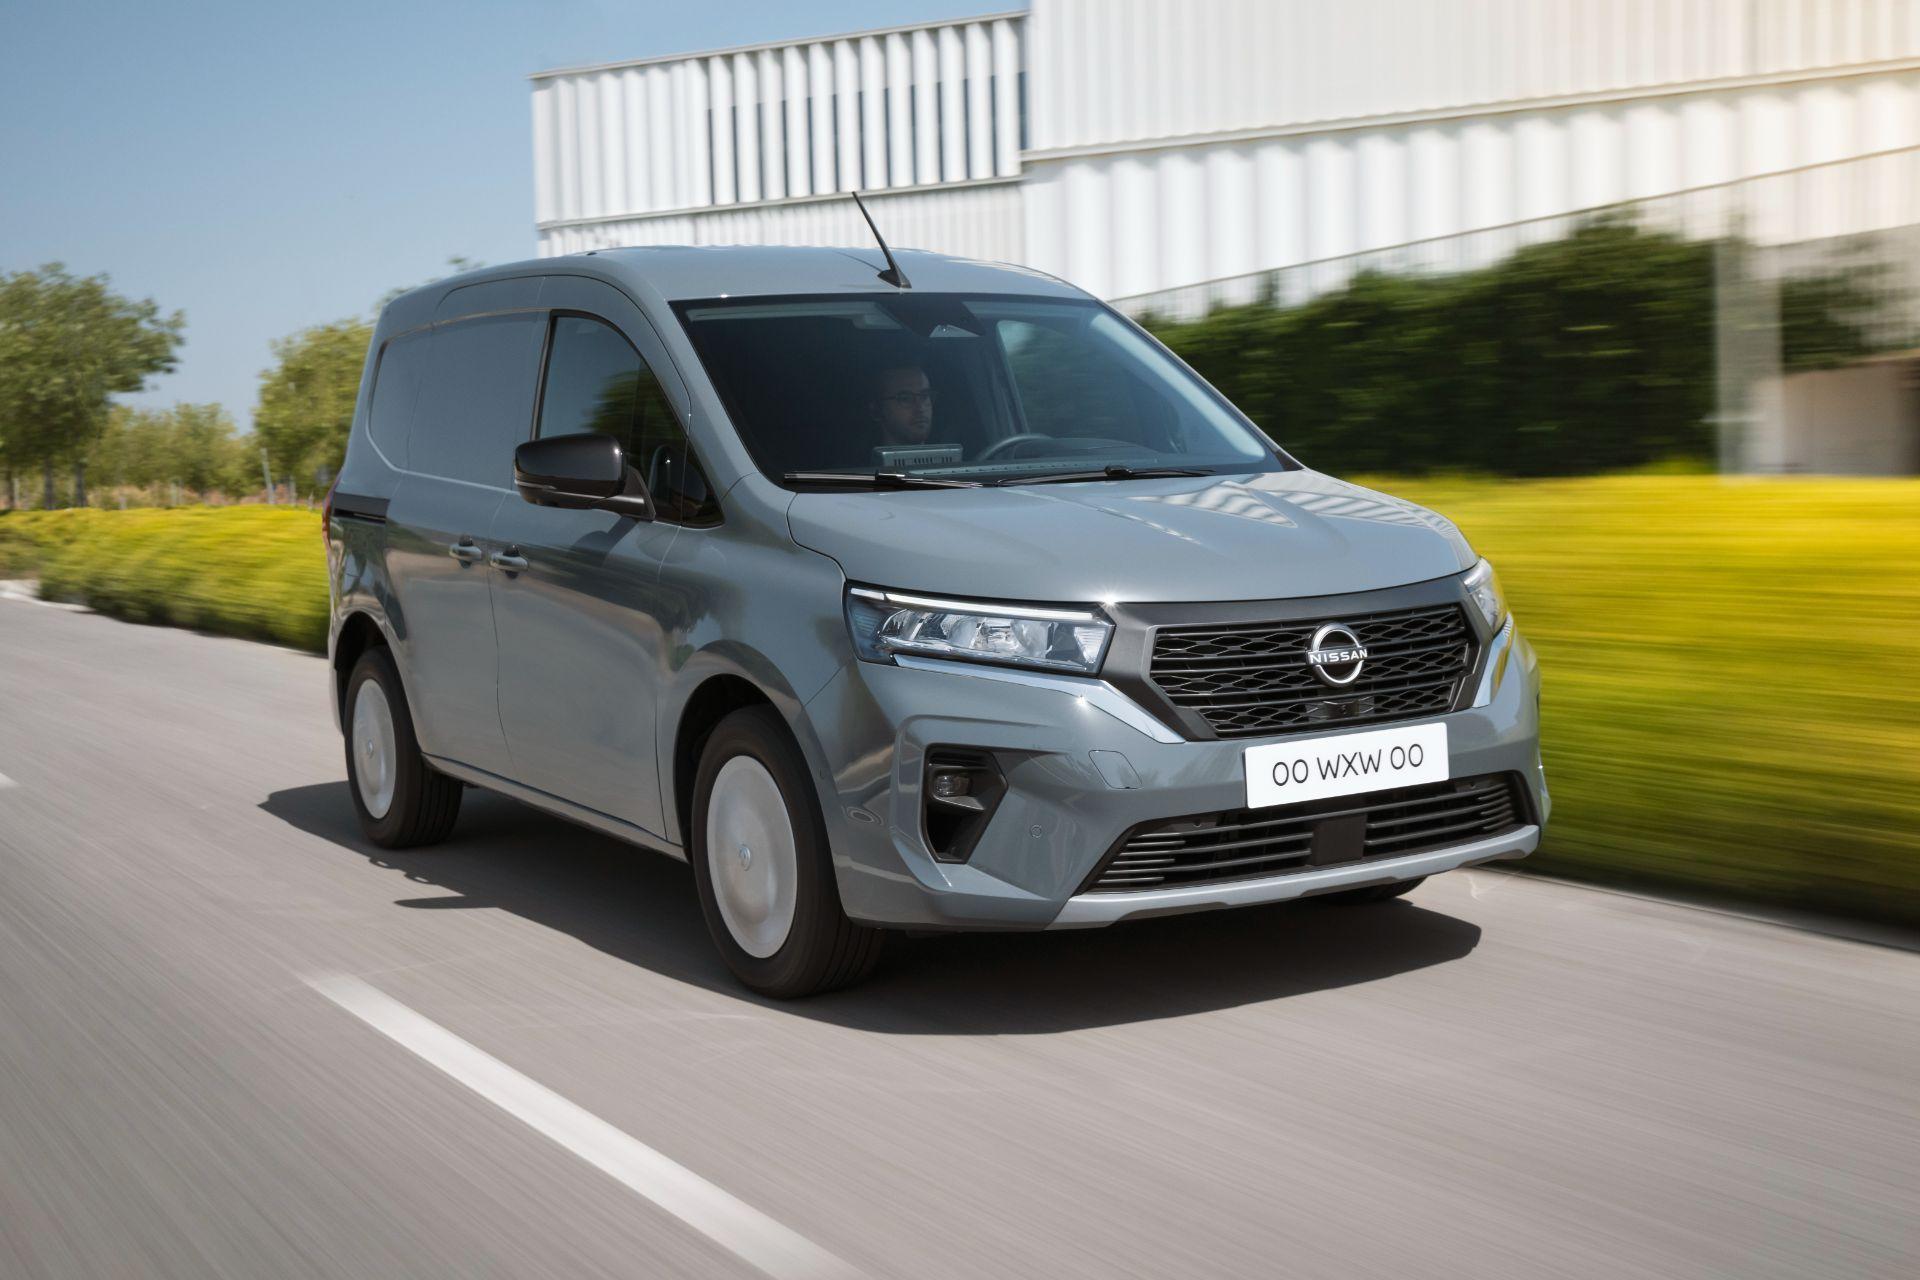 2022-Nissan-Townstar-petrol-van-dynamic-7